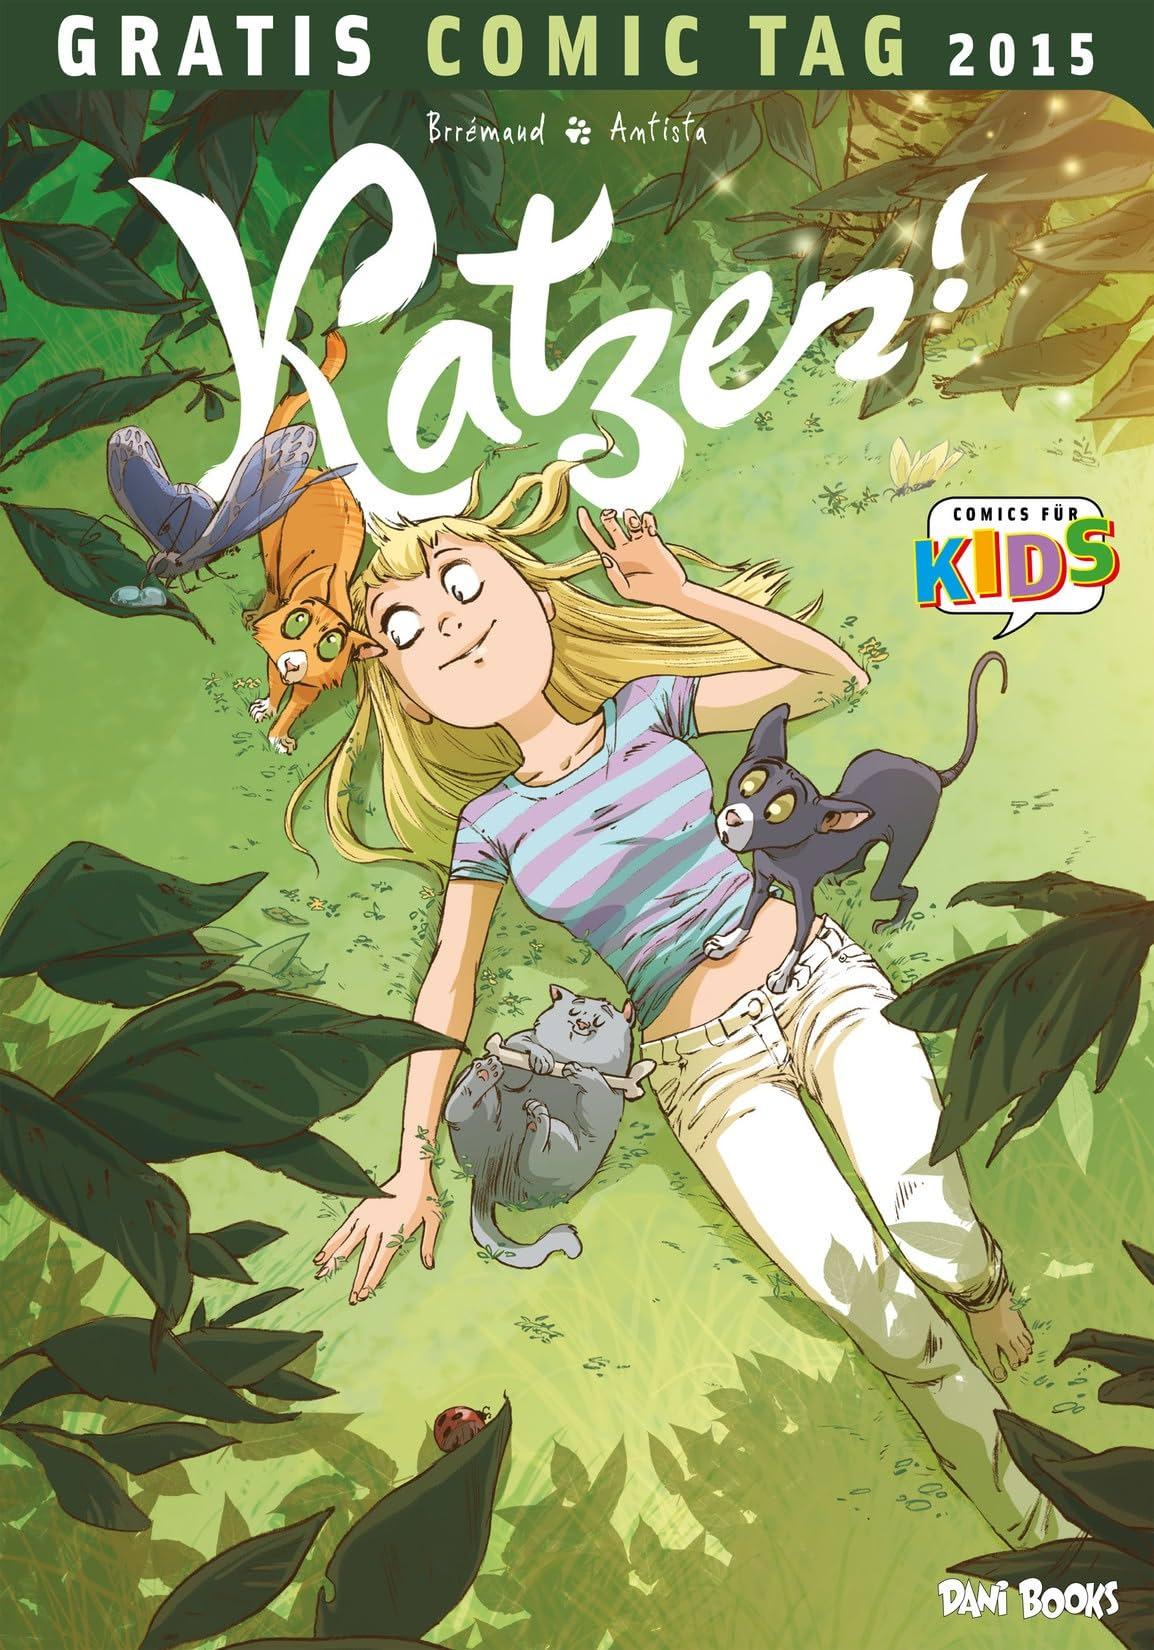 Katzen!: Gratis-Comic-Tag 2015